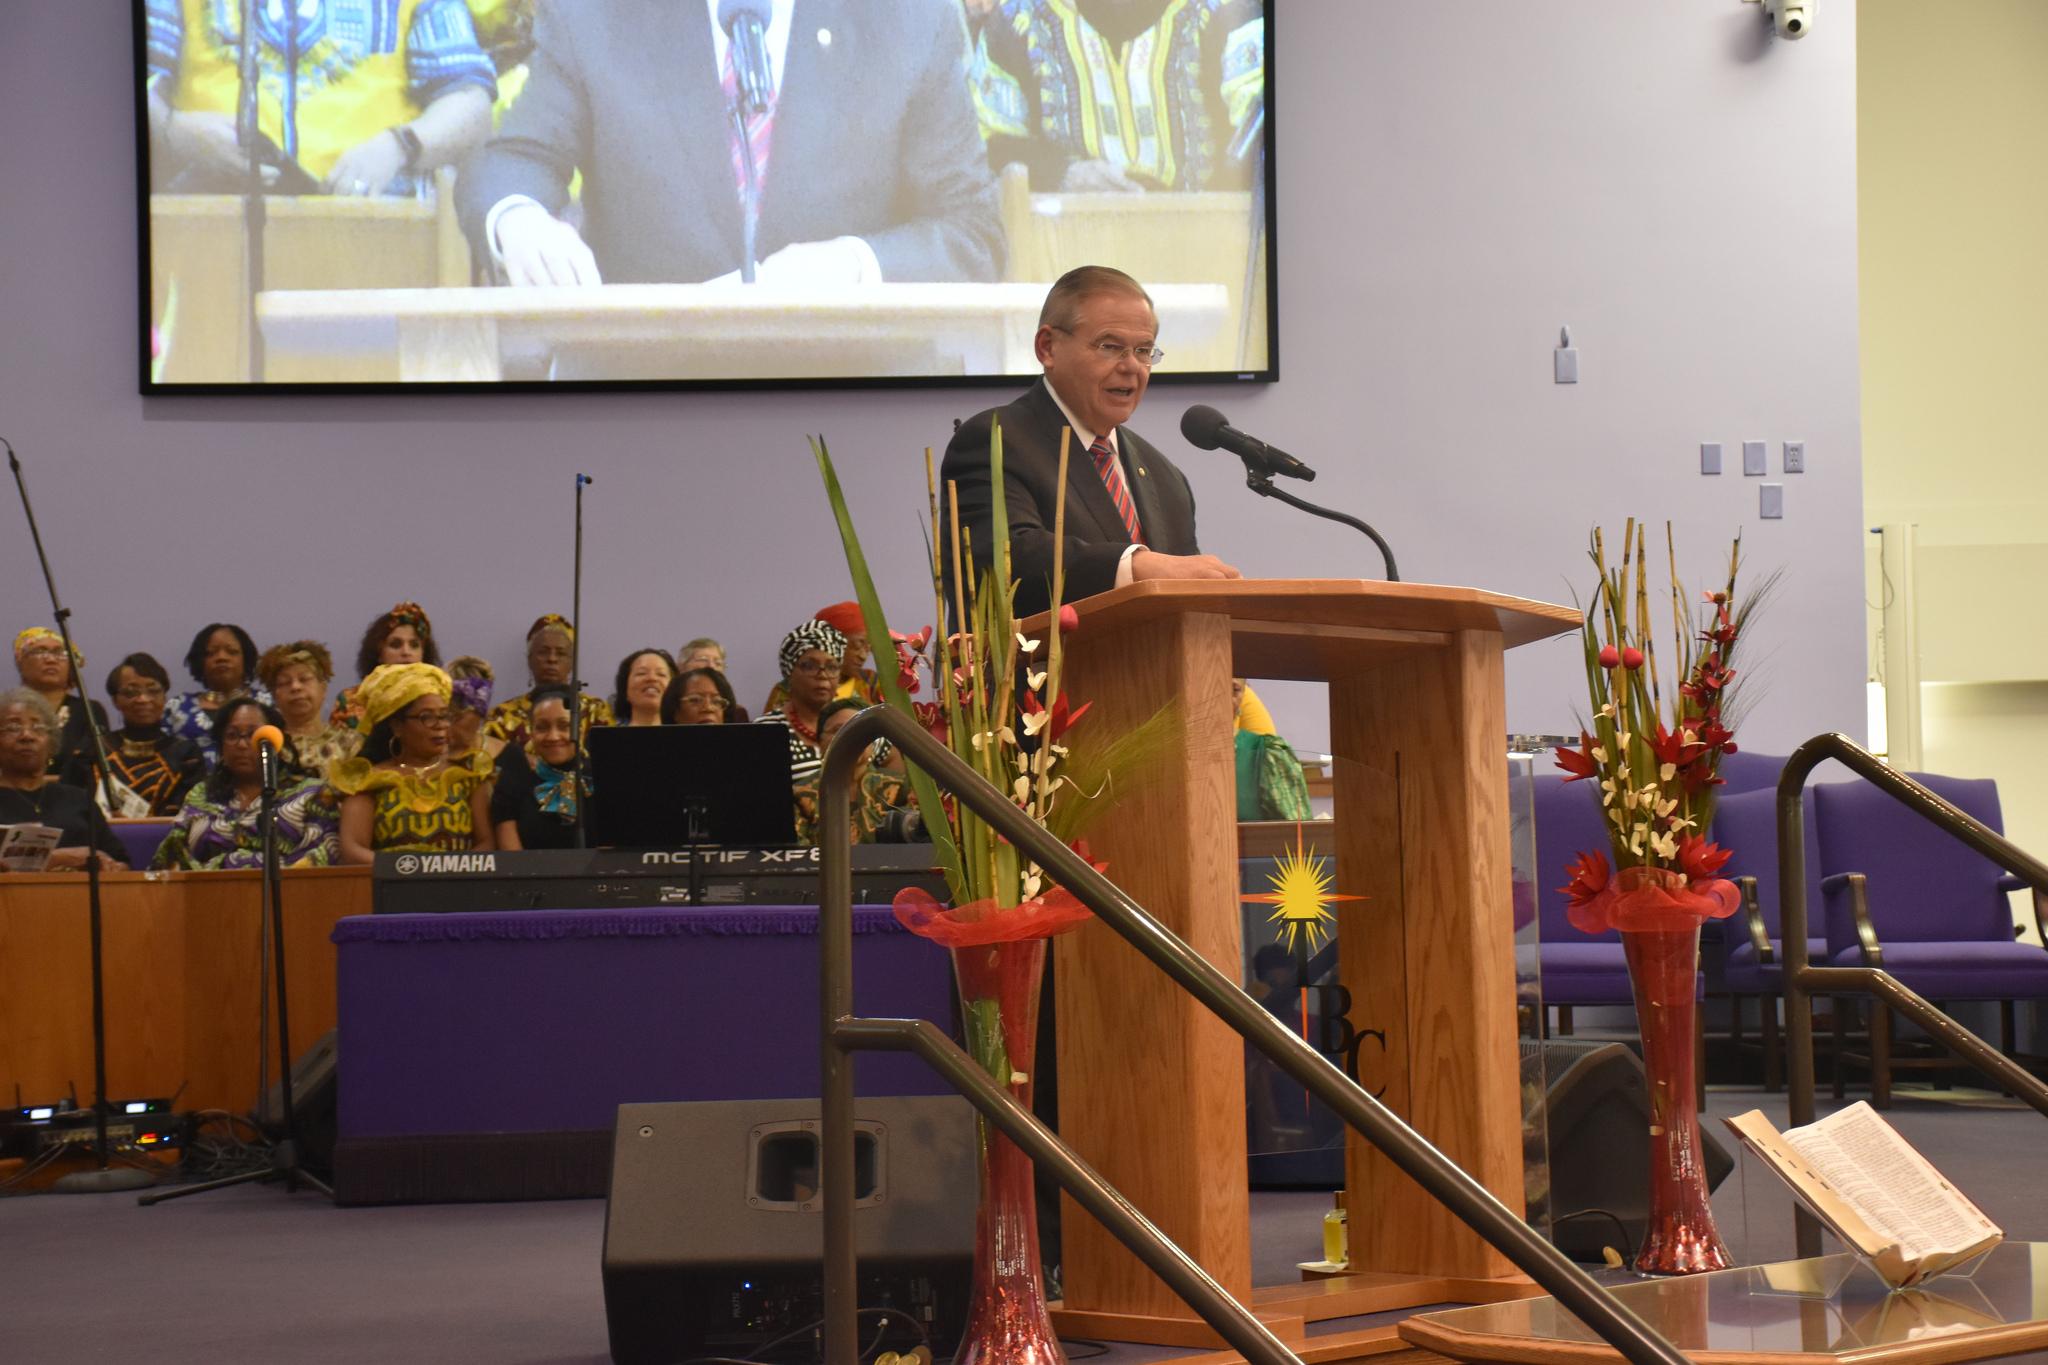 Bob Celebrates Black History Month in Burlington